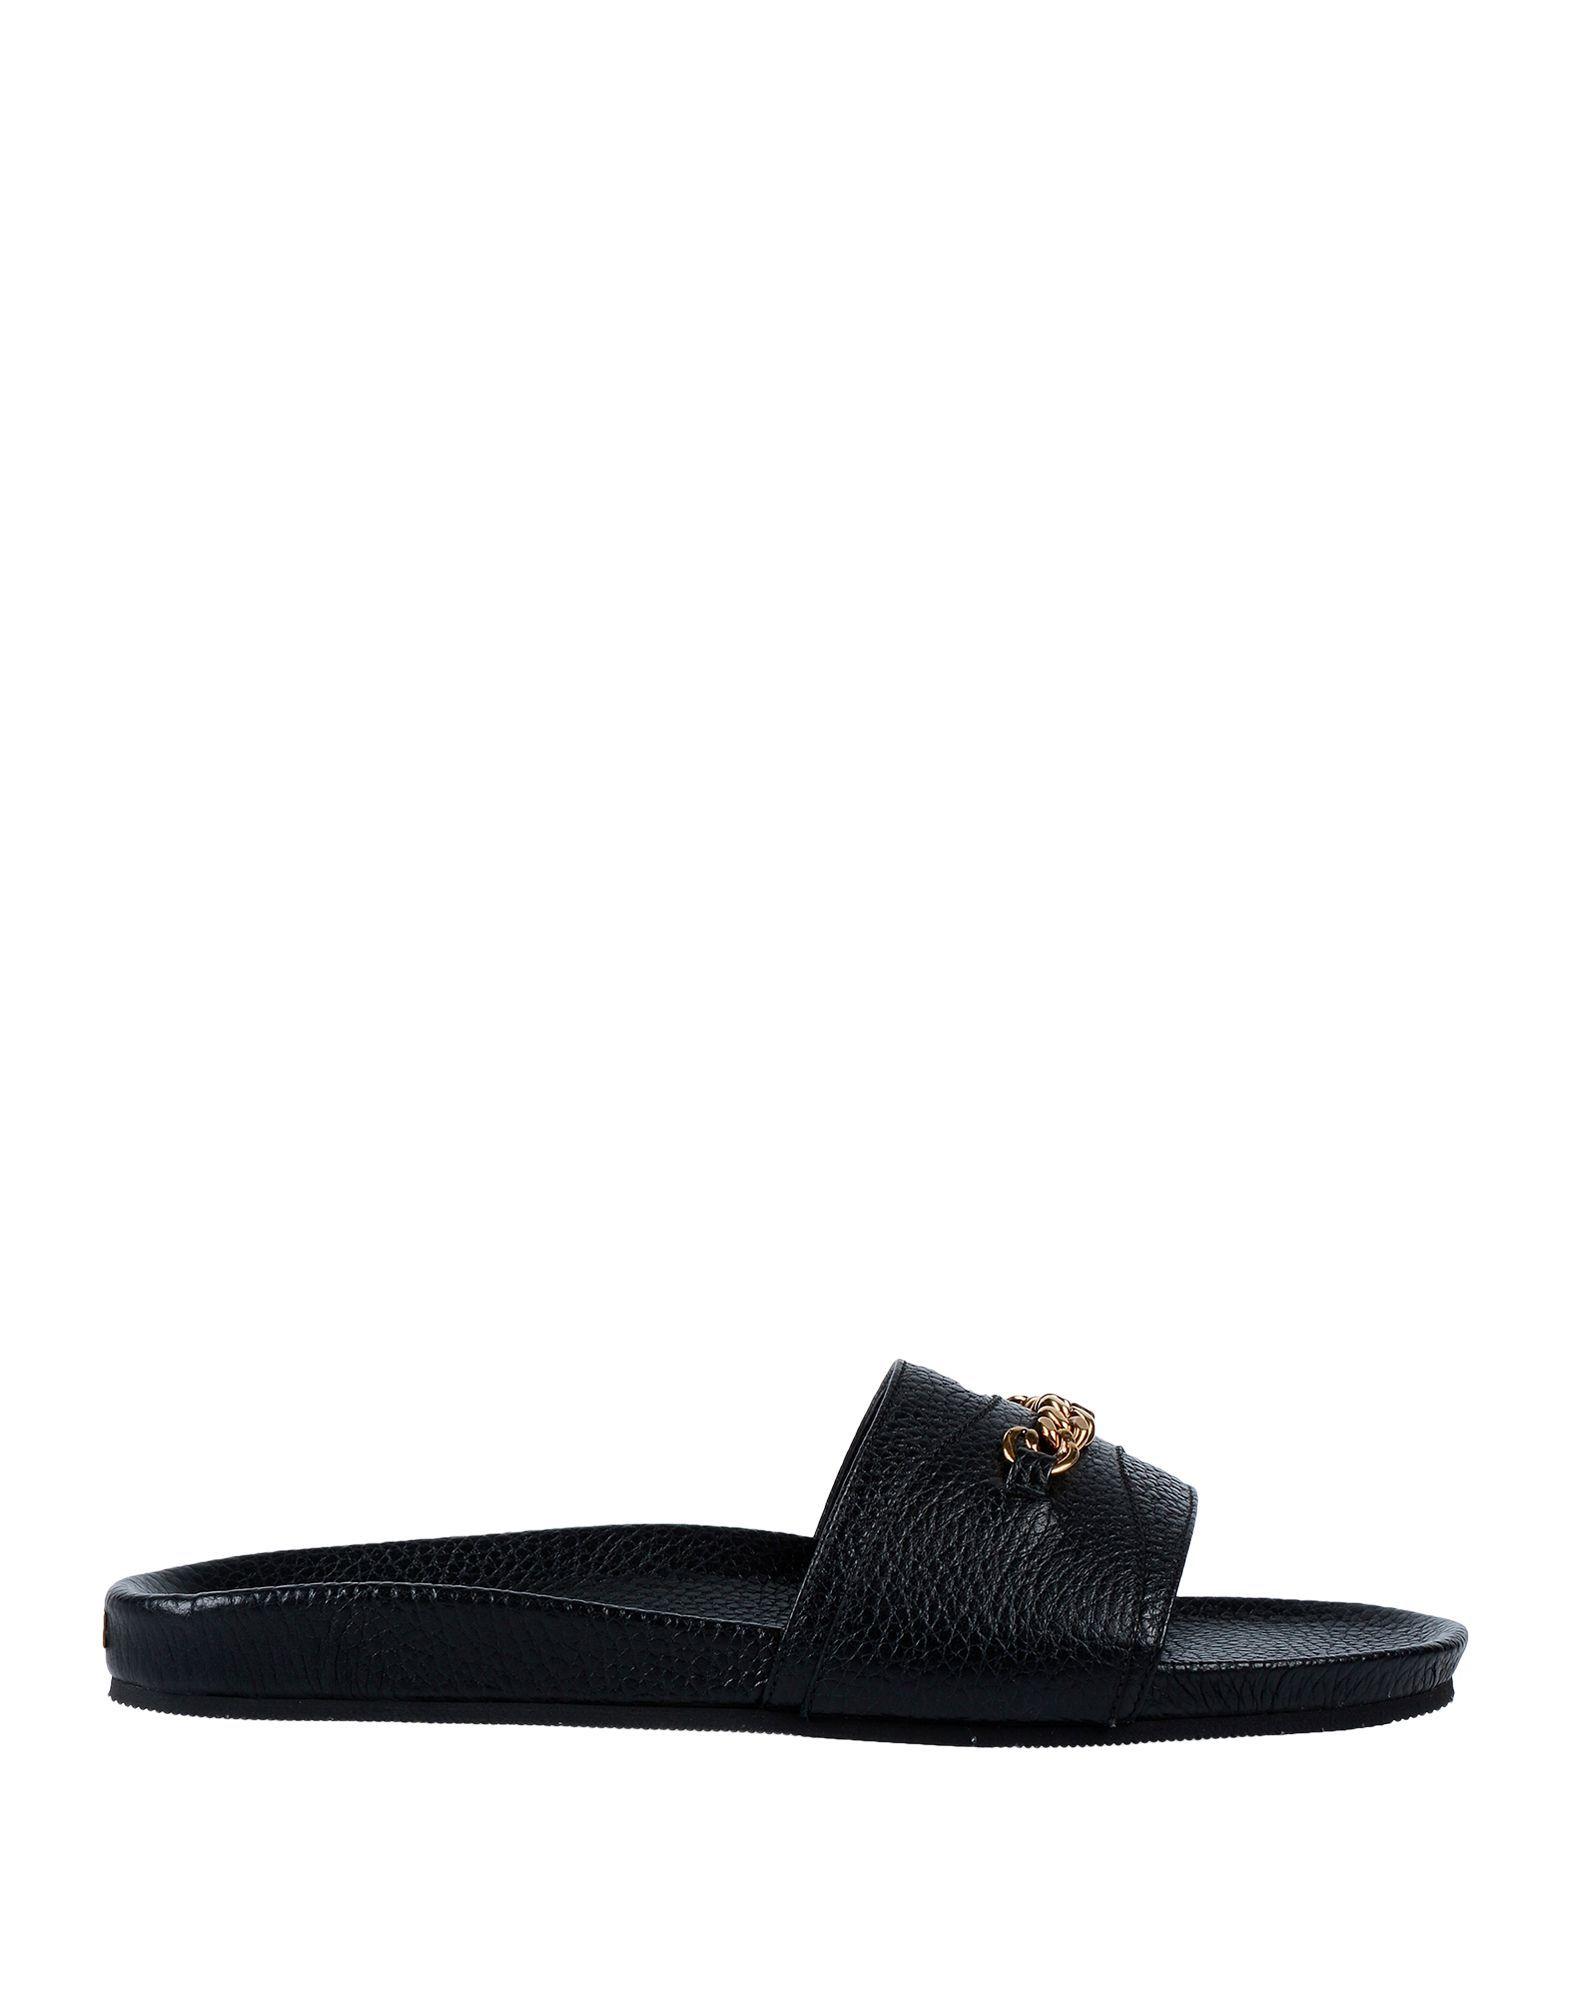 694dd01c0d8c TOM FORD SANDALS.  tomford  shoes